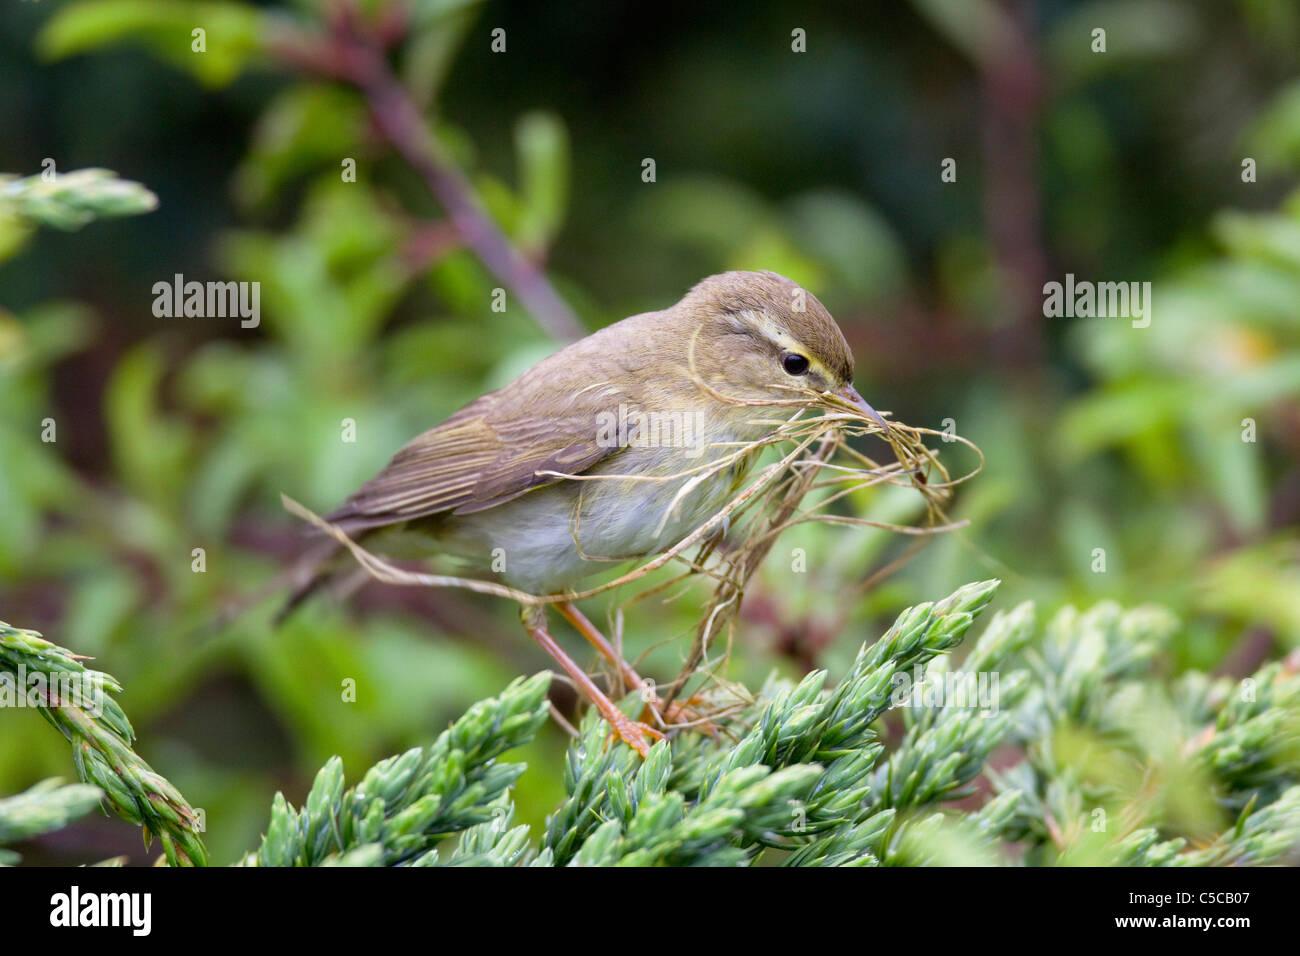 Curruca; Phylloscopus trochilus sauce; Escocia; con material de anidación Imagen De Stock